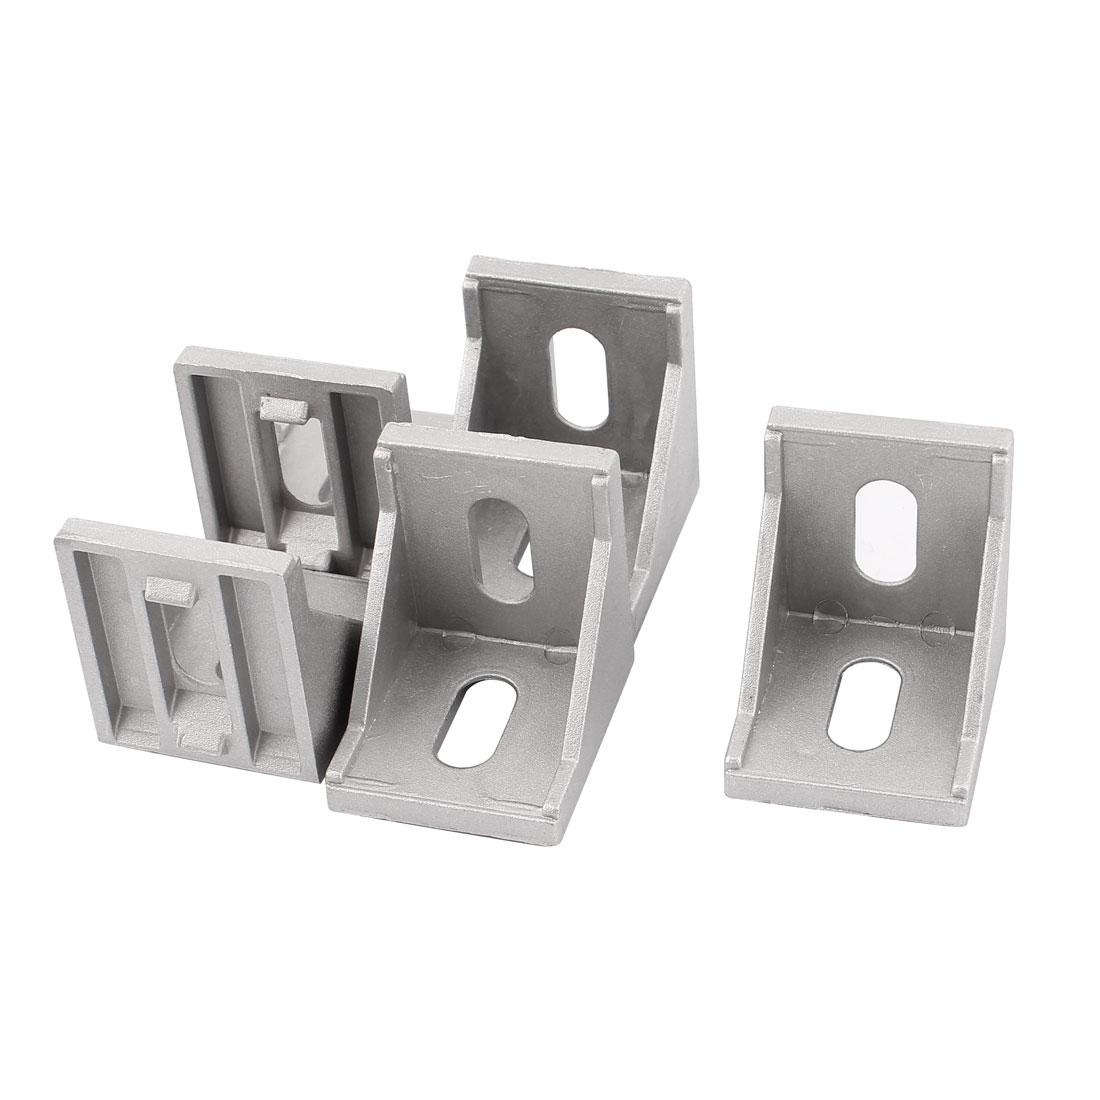 Silver Tone 40mmx40mm 2 Holes 90 Degree Corner Brace Angle Bracket 5Pcs